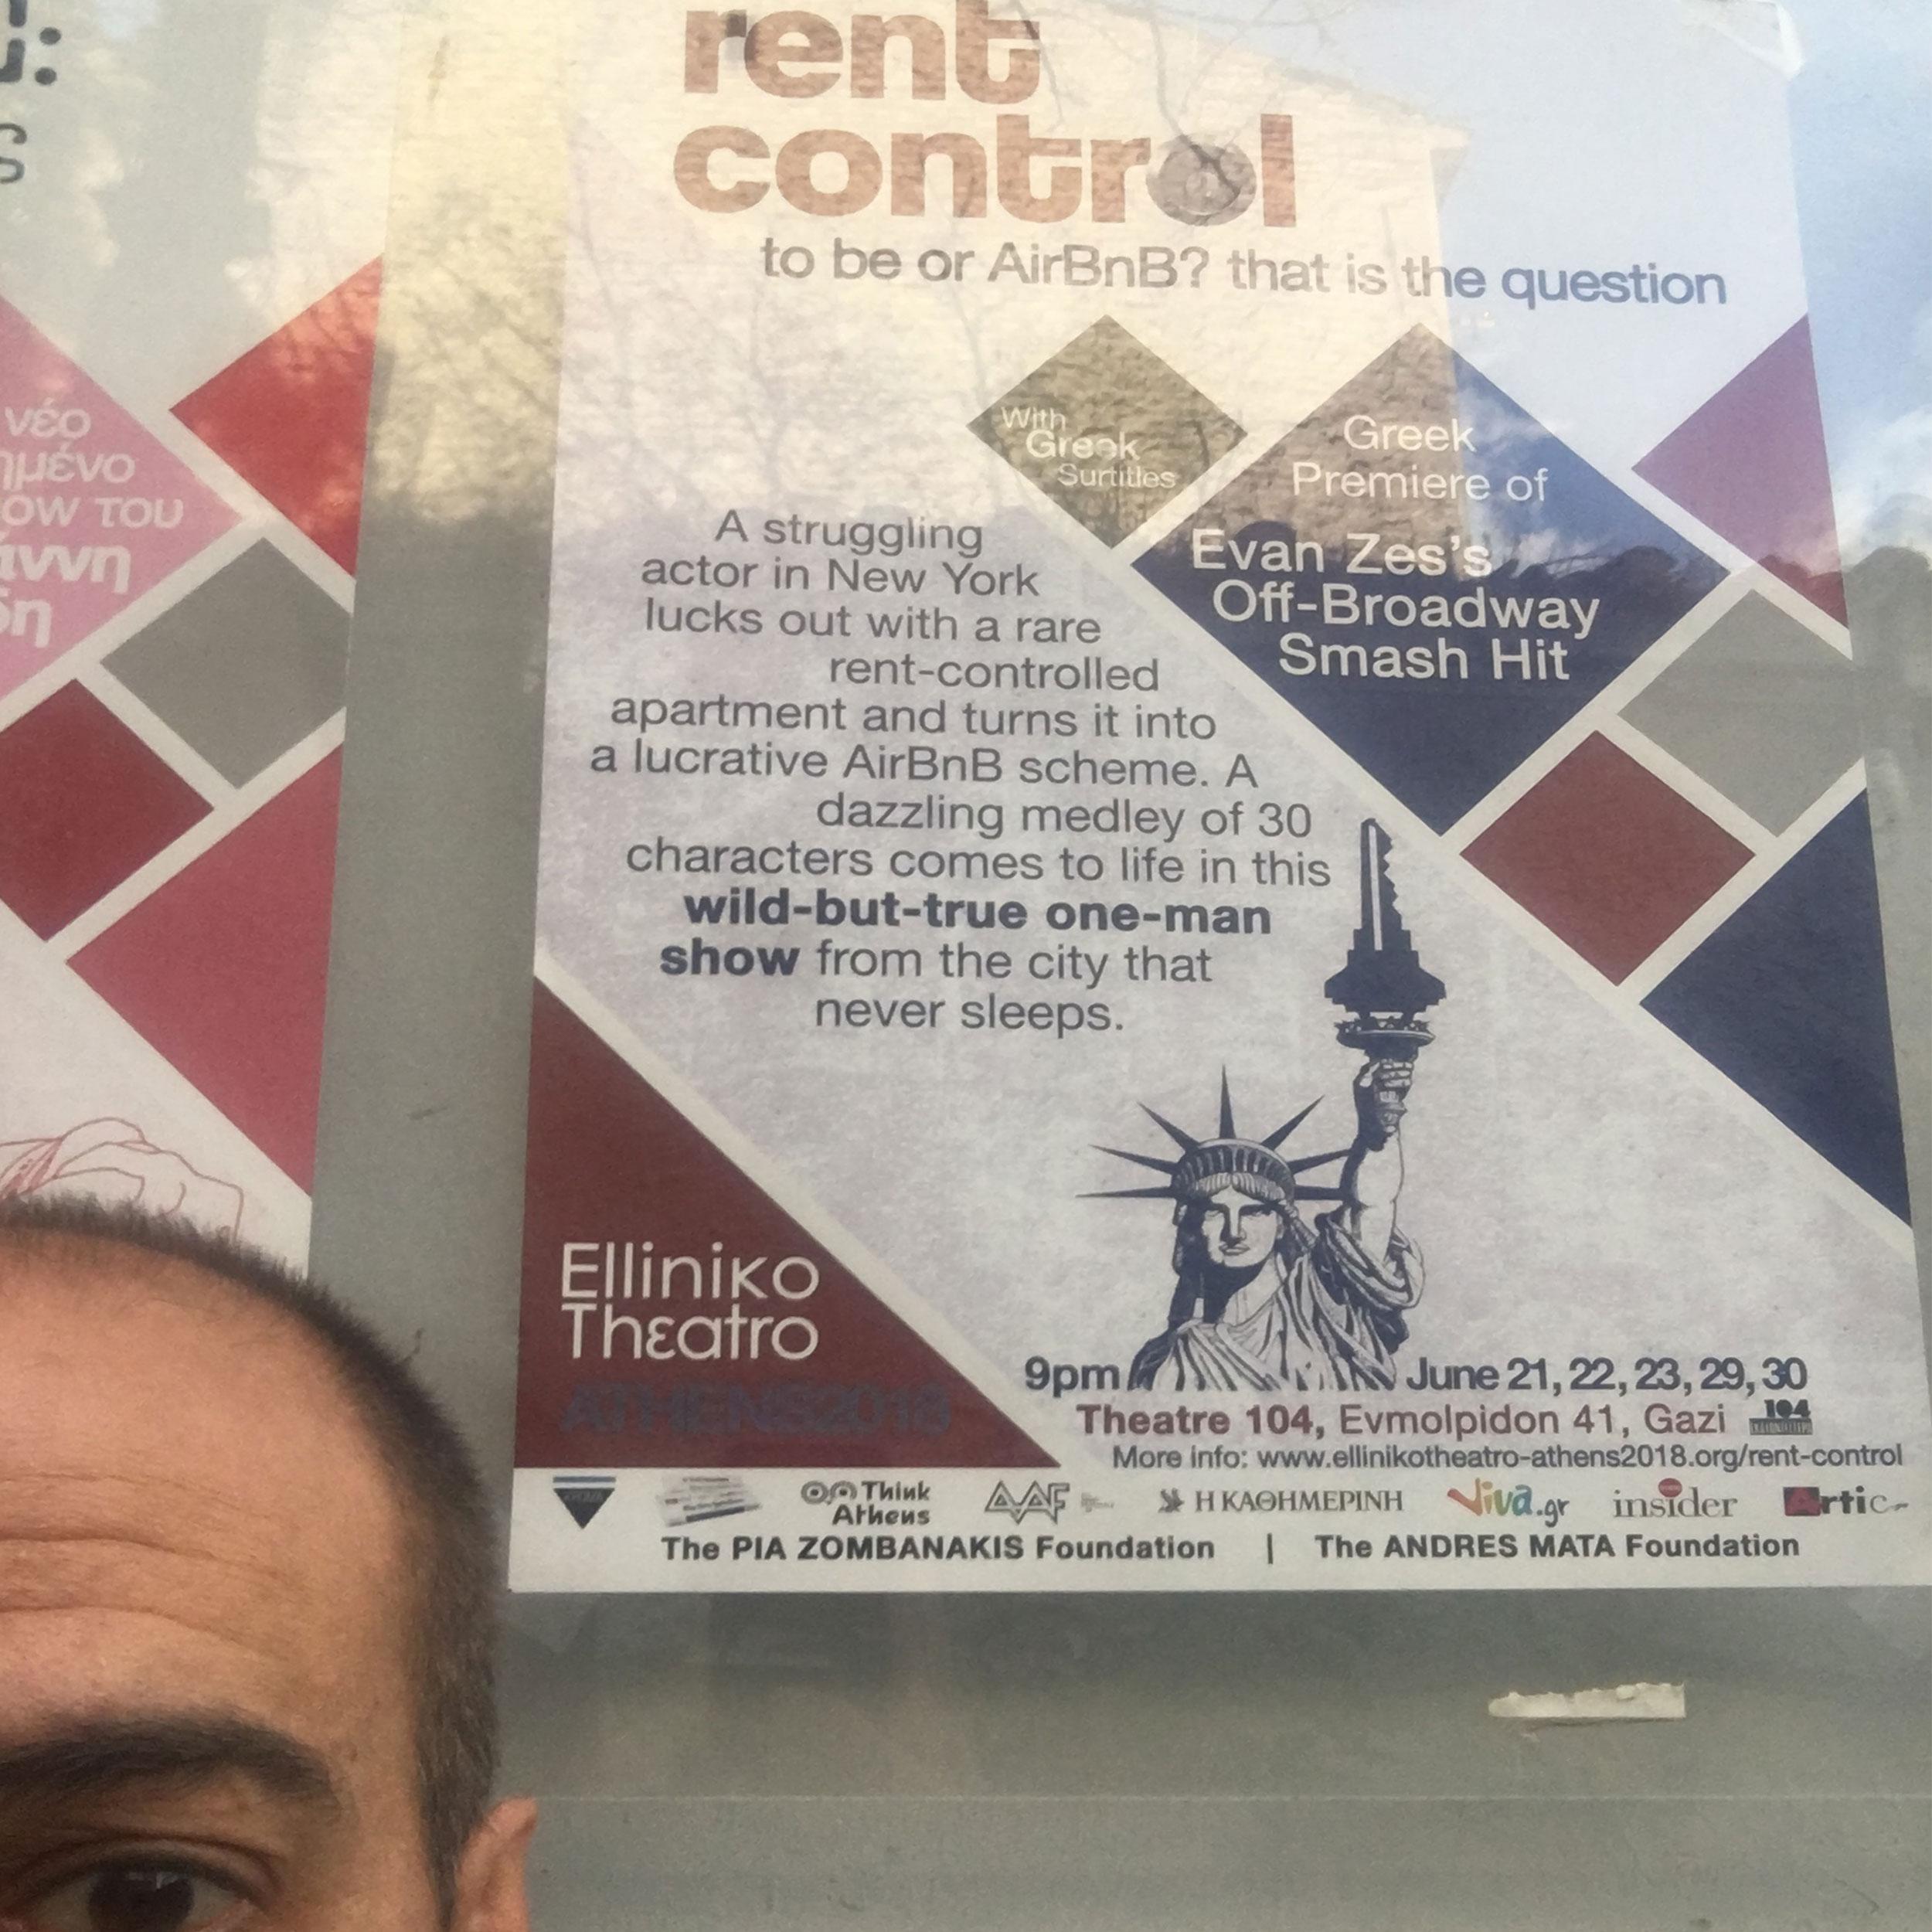 rent_control_elliniko_social_yassou_2500_sfw_meta.jpg